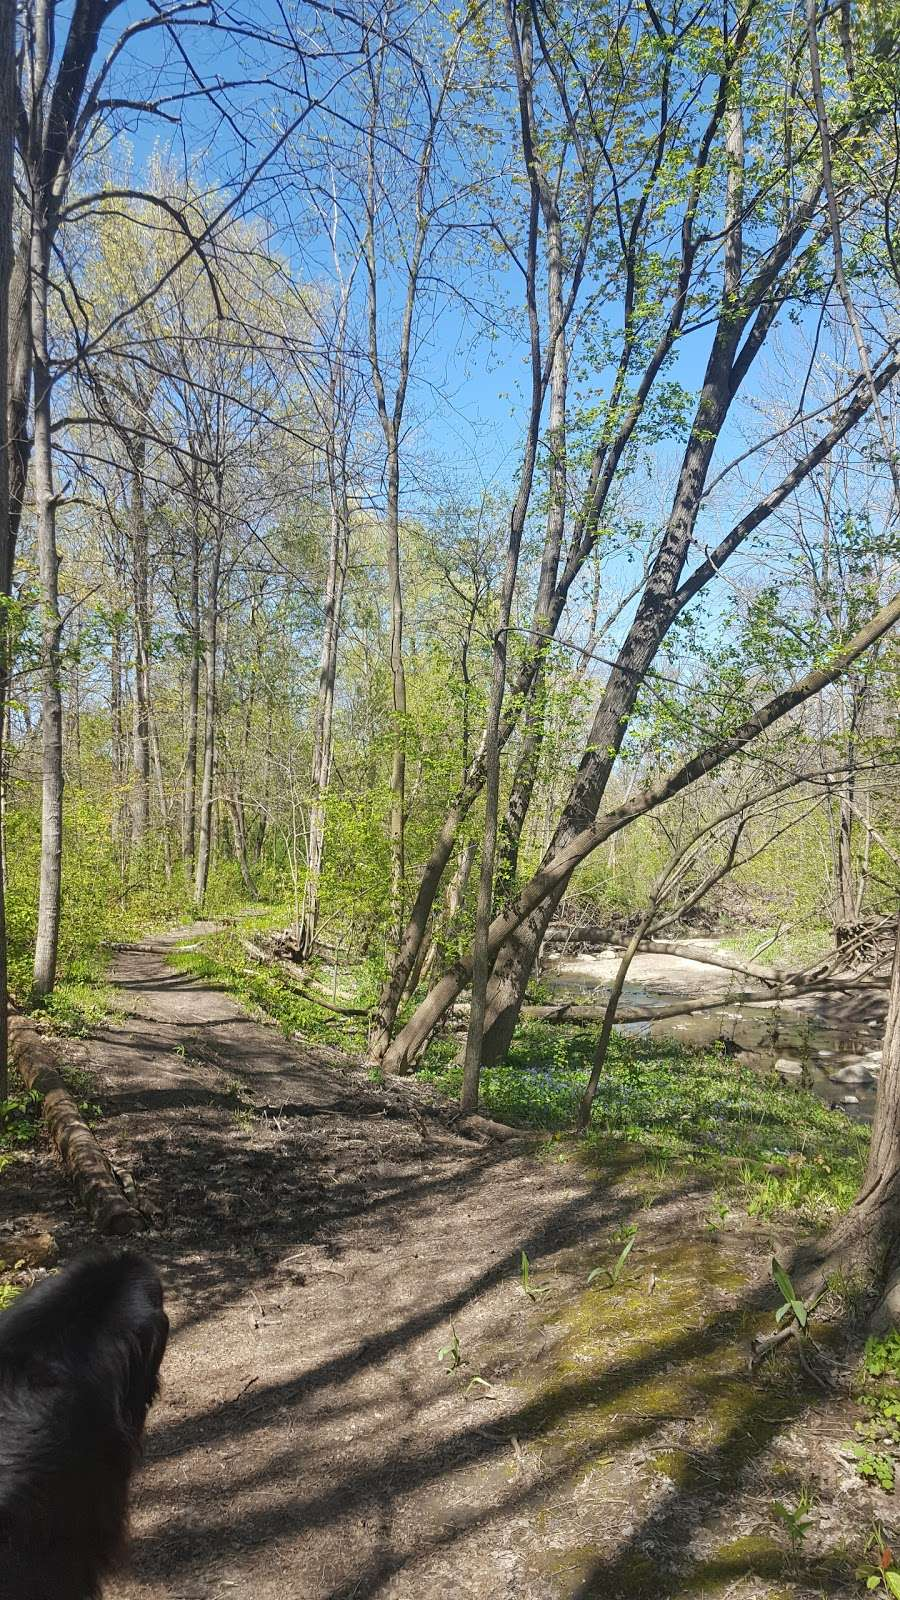 Kinnickinnic River Parkway - park  | Photo 5 of 10 | Address: W Rita Dr, Milwaukee, WI 53219, USA | Phone: (414) 643-0120